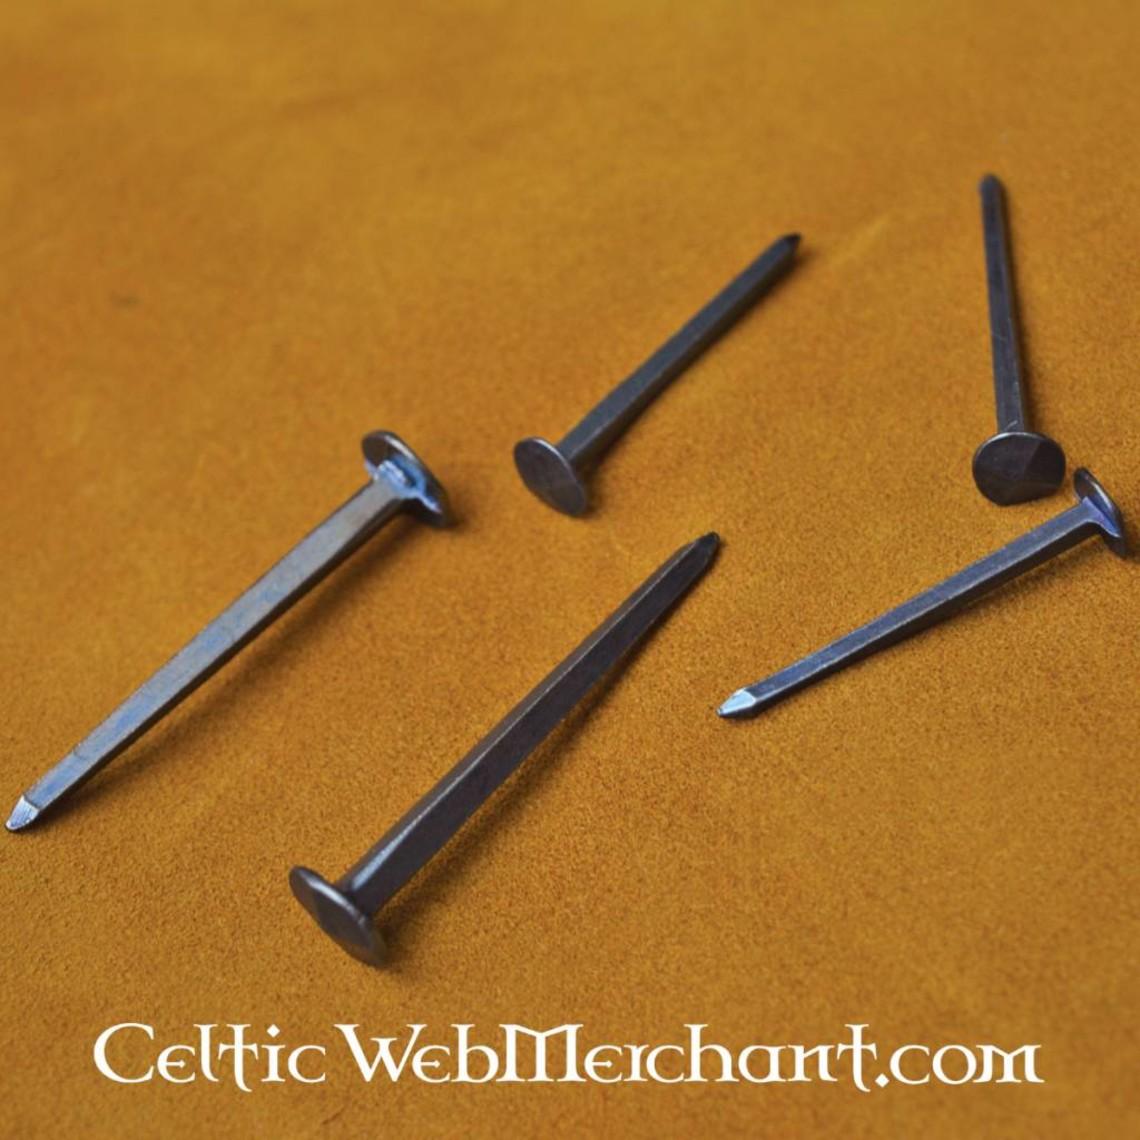 Nail 6 pollici (50 pezzi)